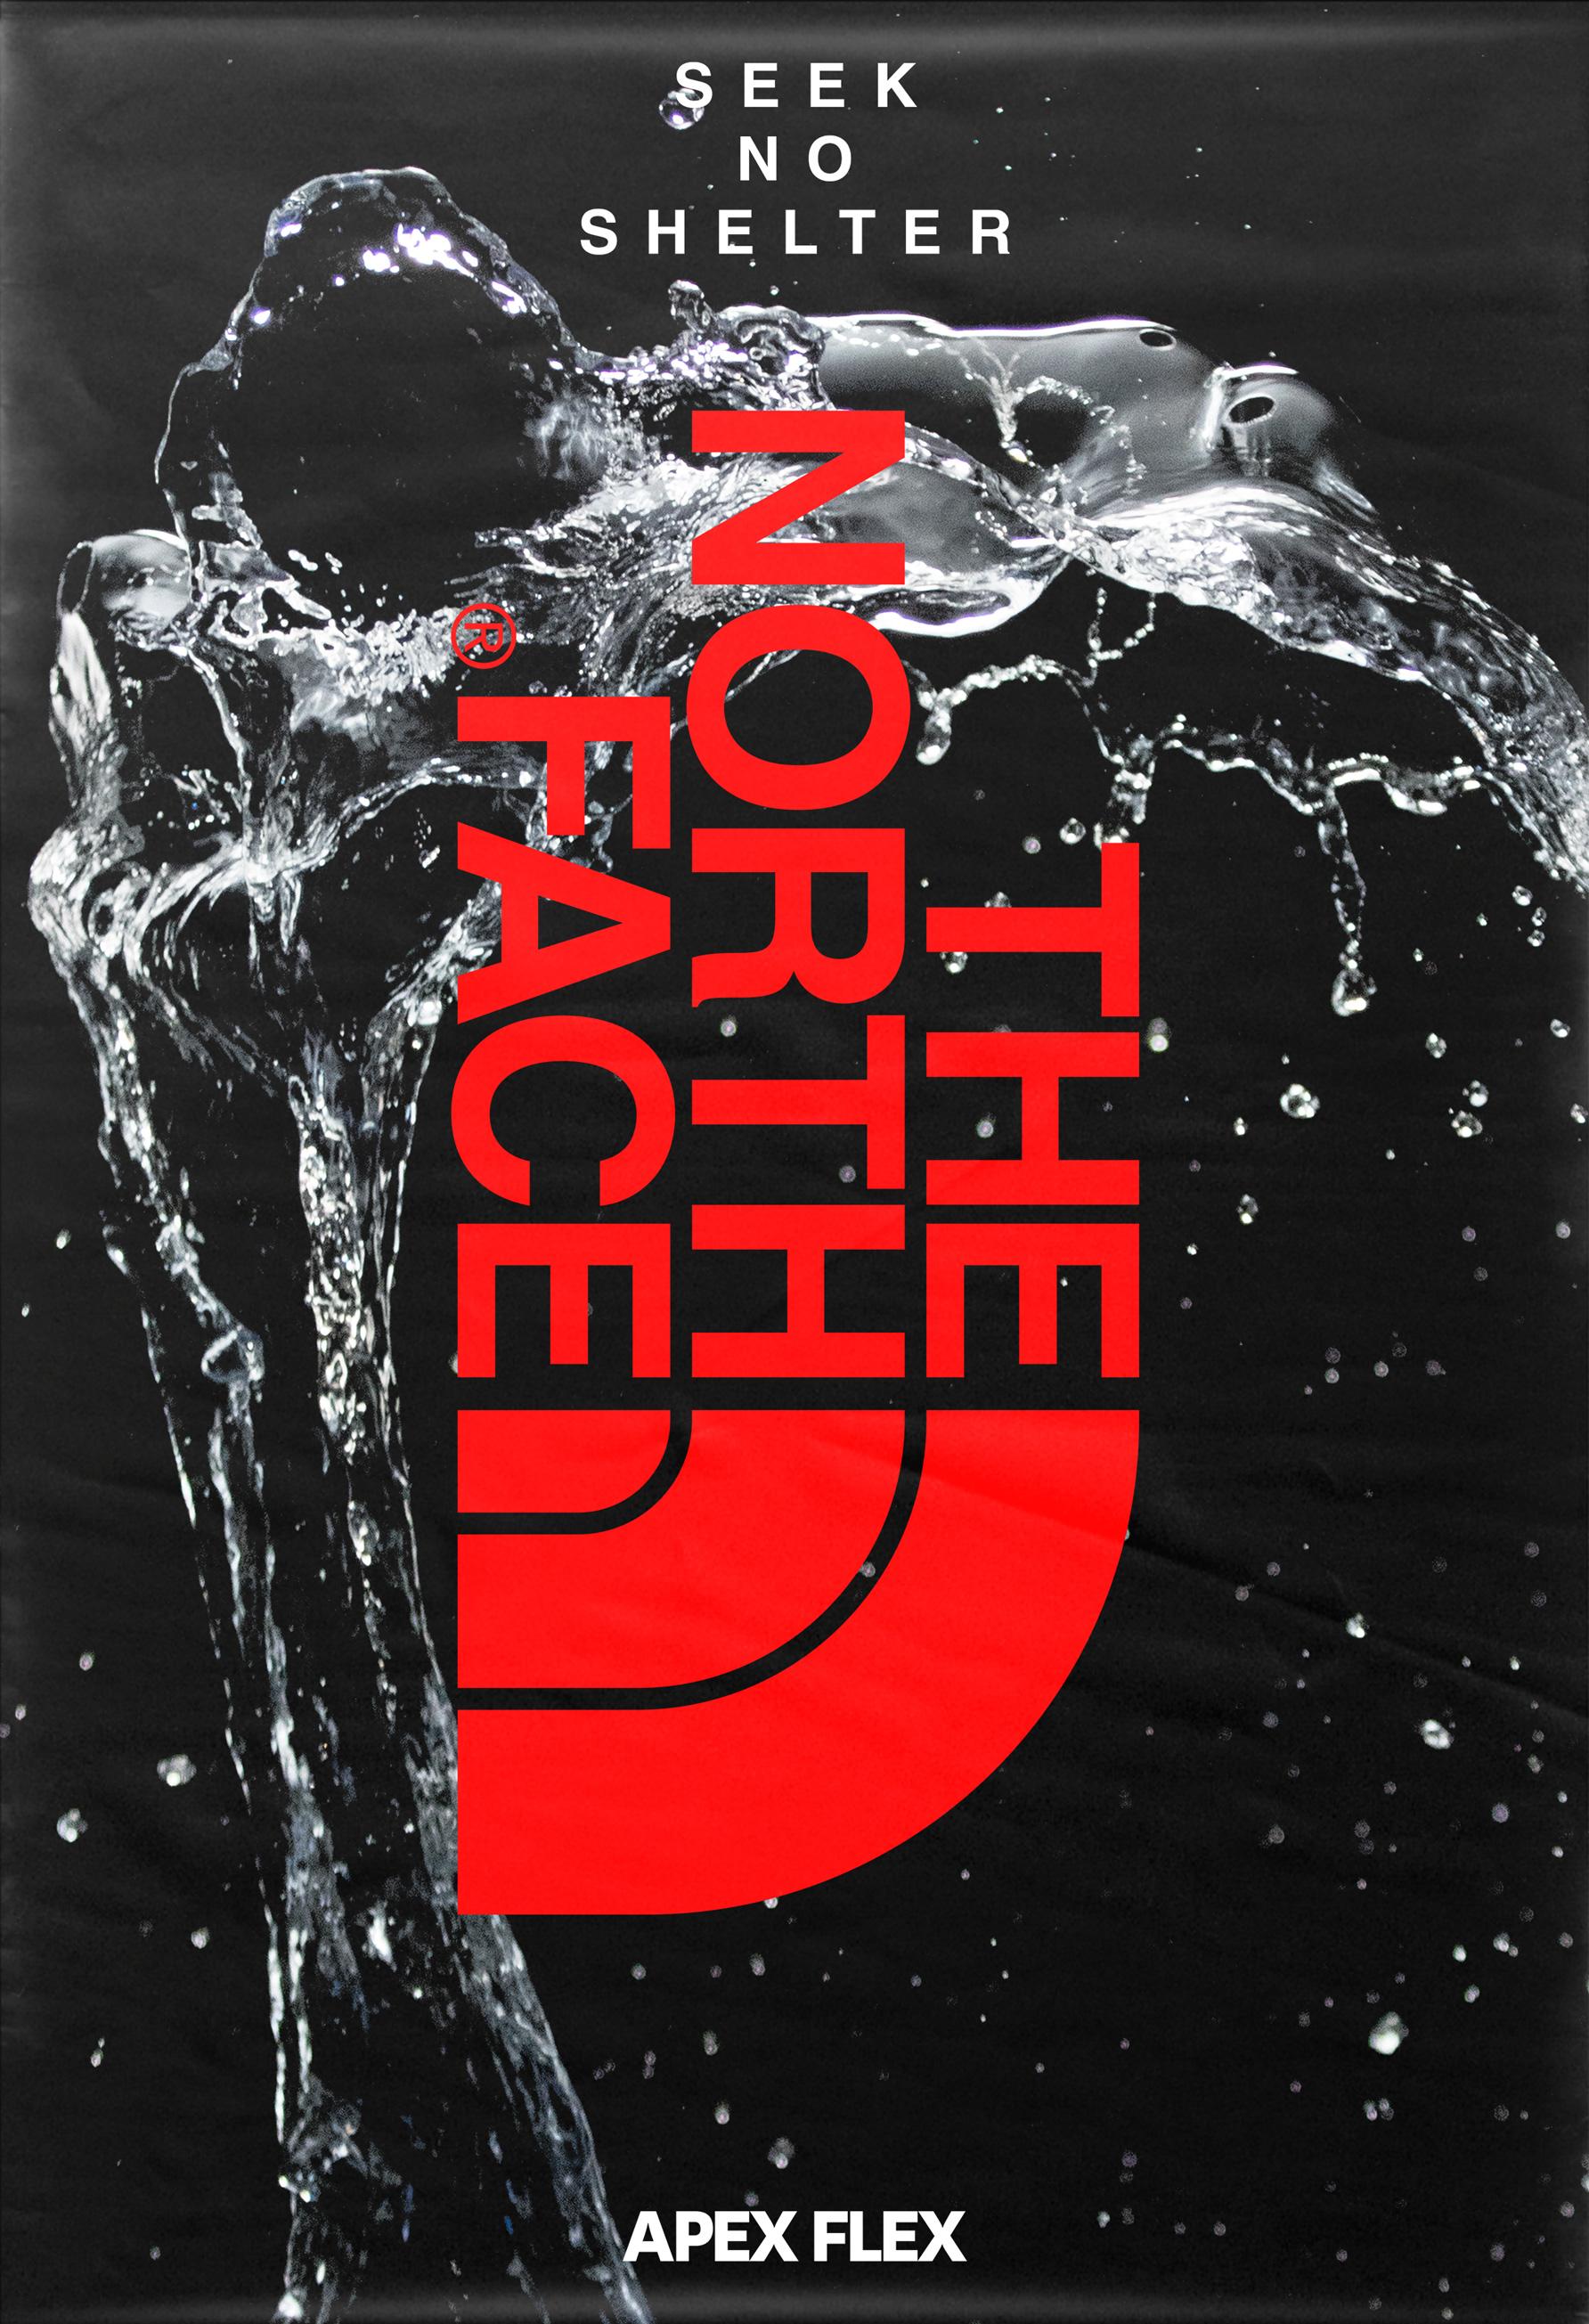 The North Face's Apex Flex - Poster